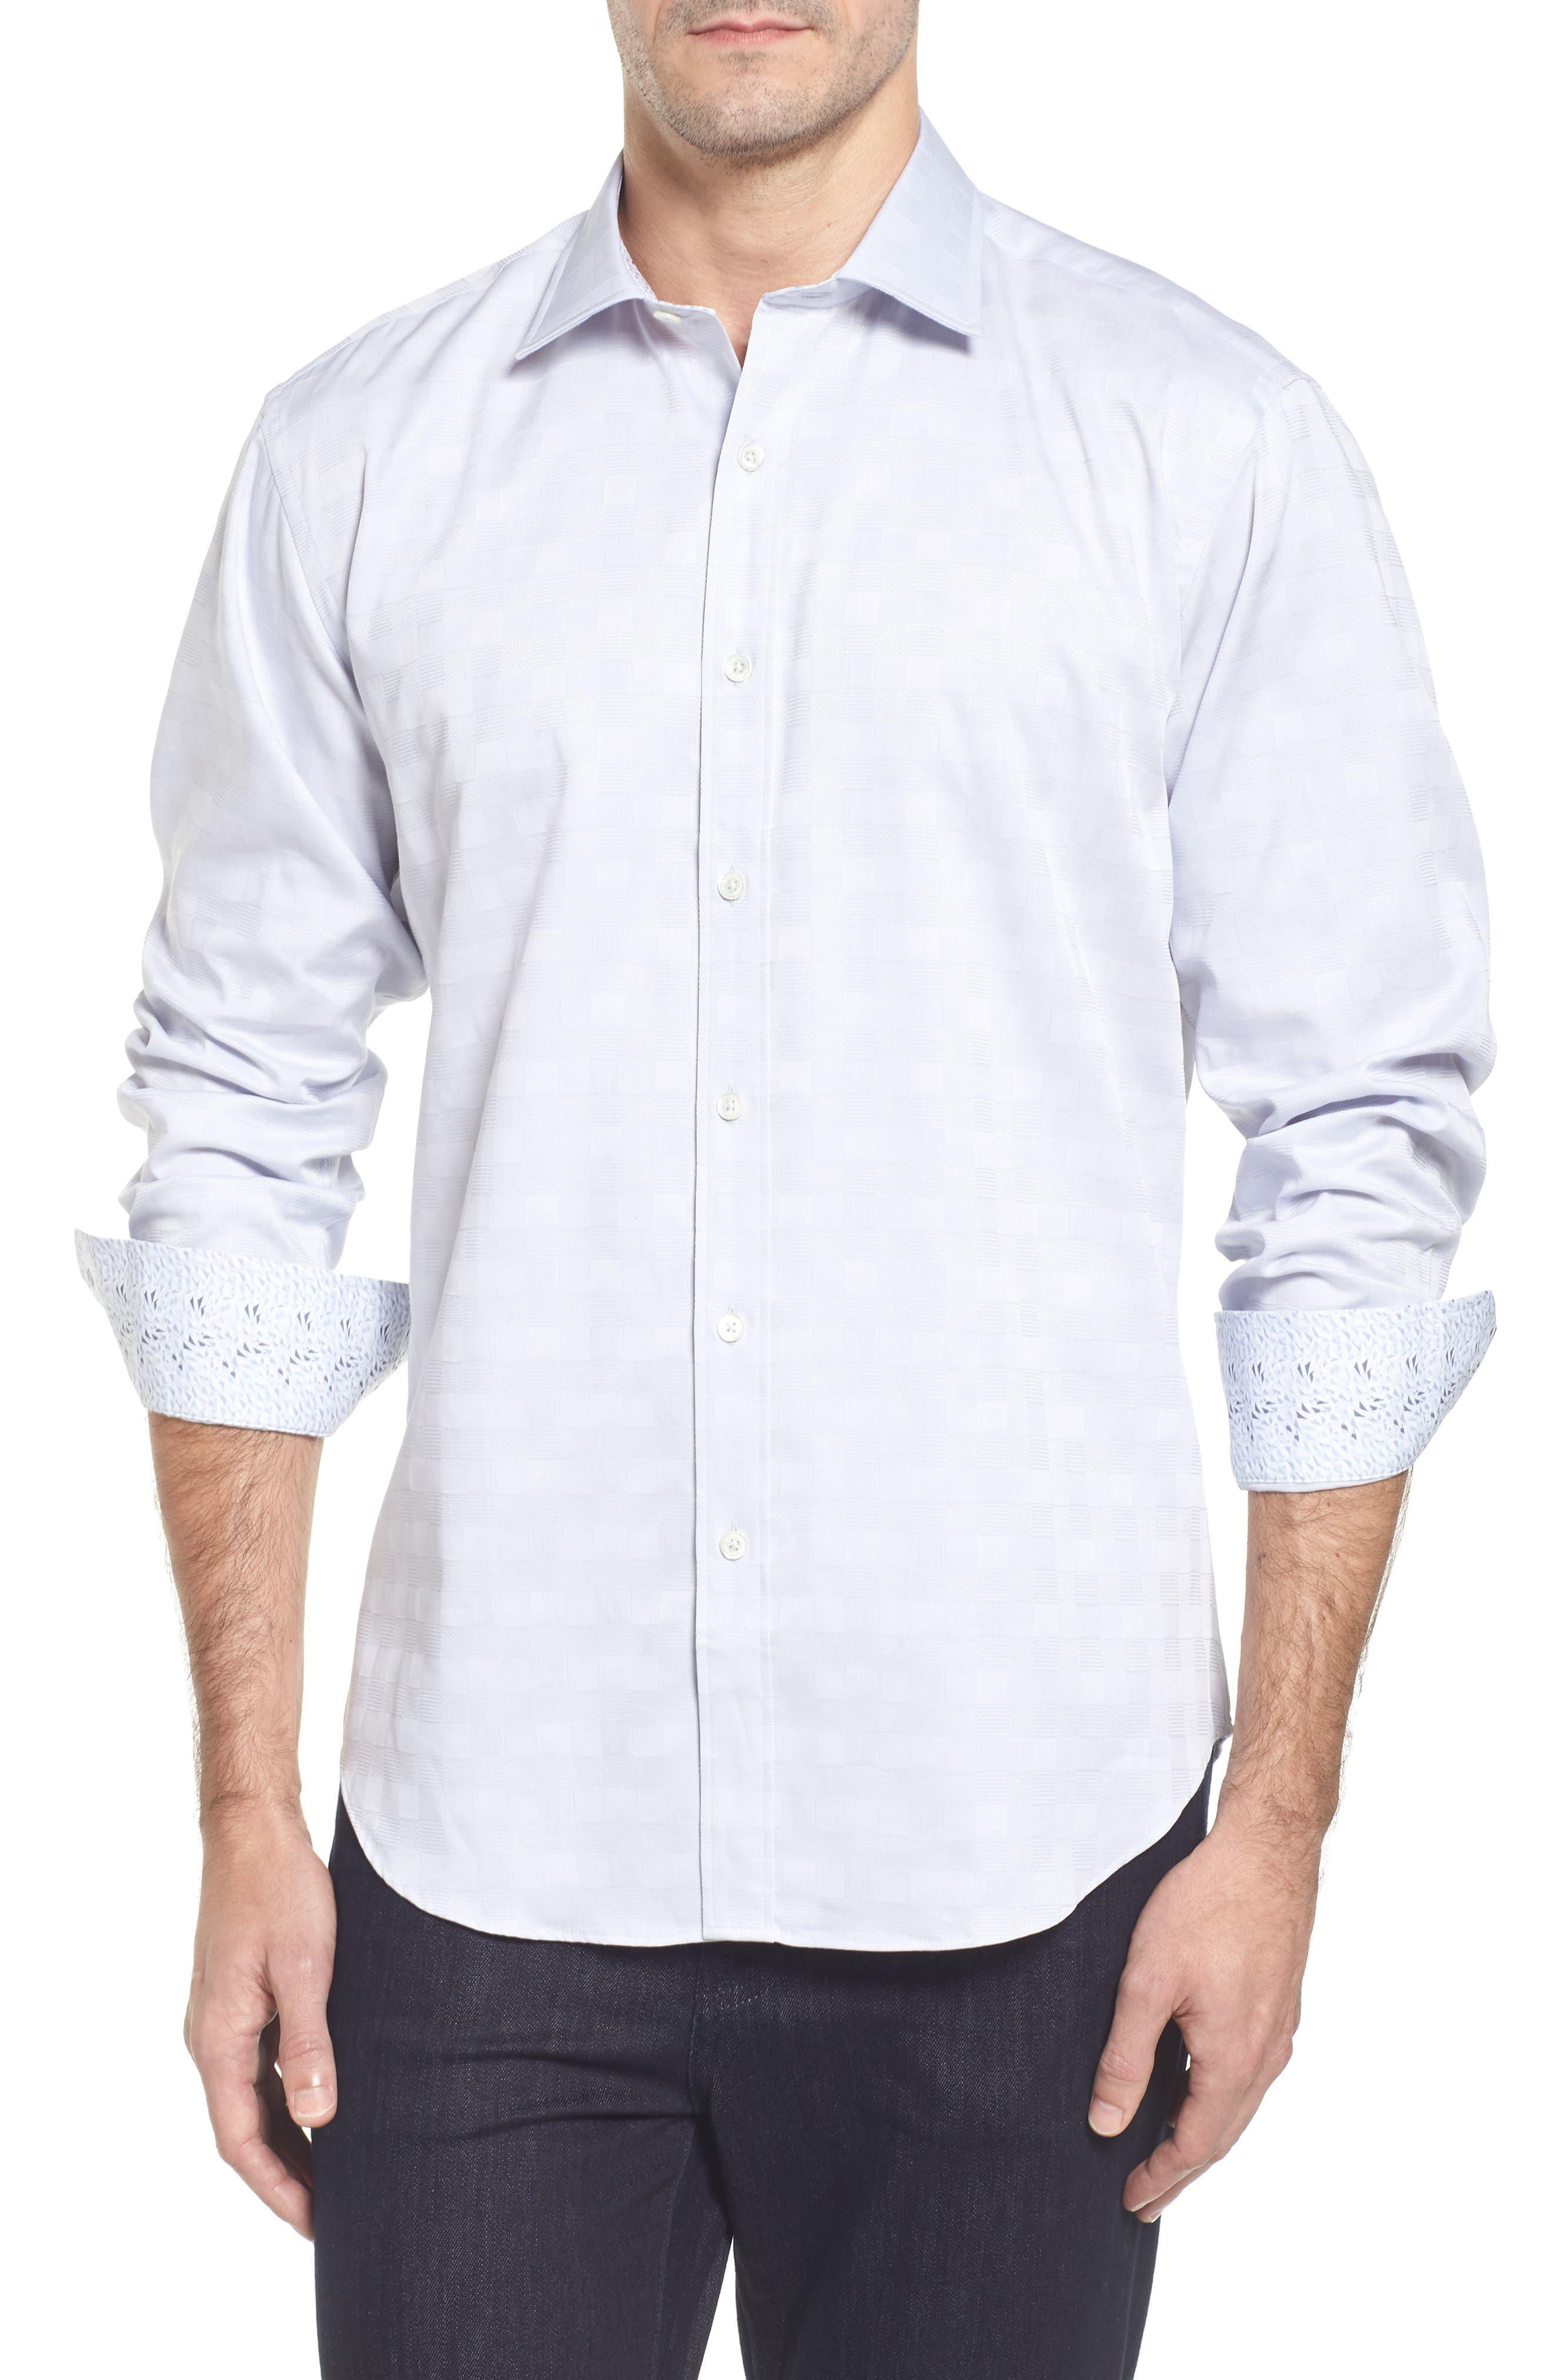 BUGATCHI,                             Classic Fit Check Jacquard Sport Shirt,                             Main thumbnail 1, color,                             040